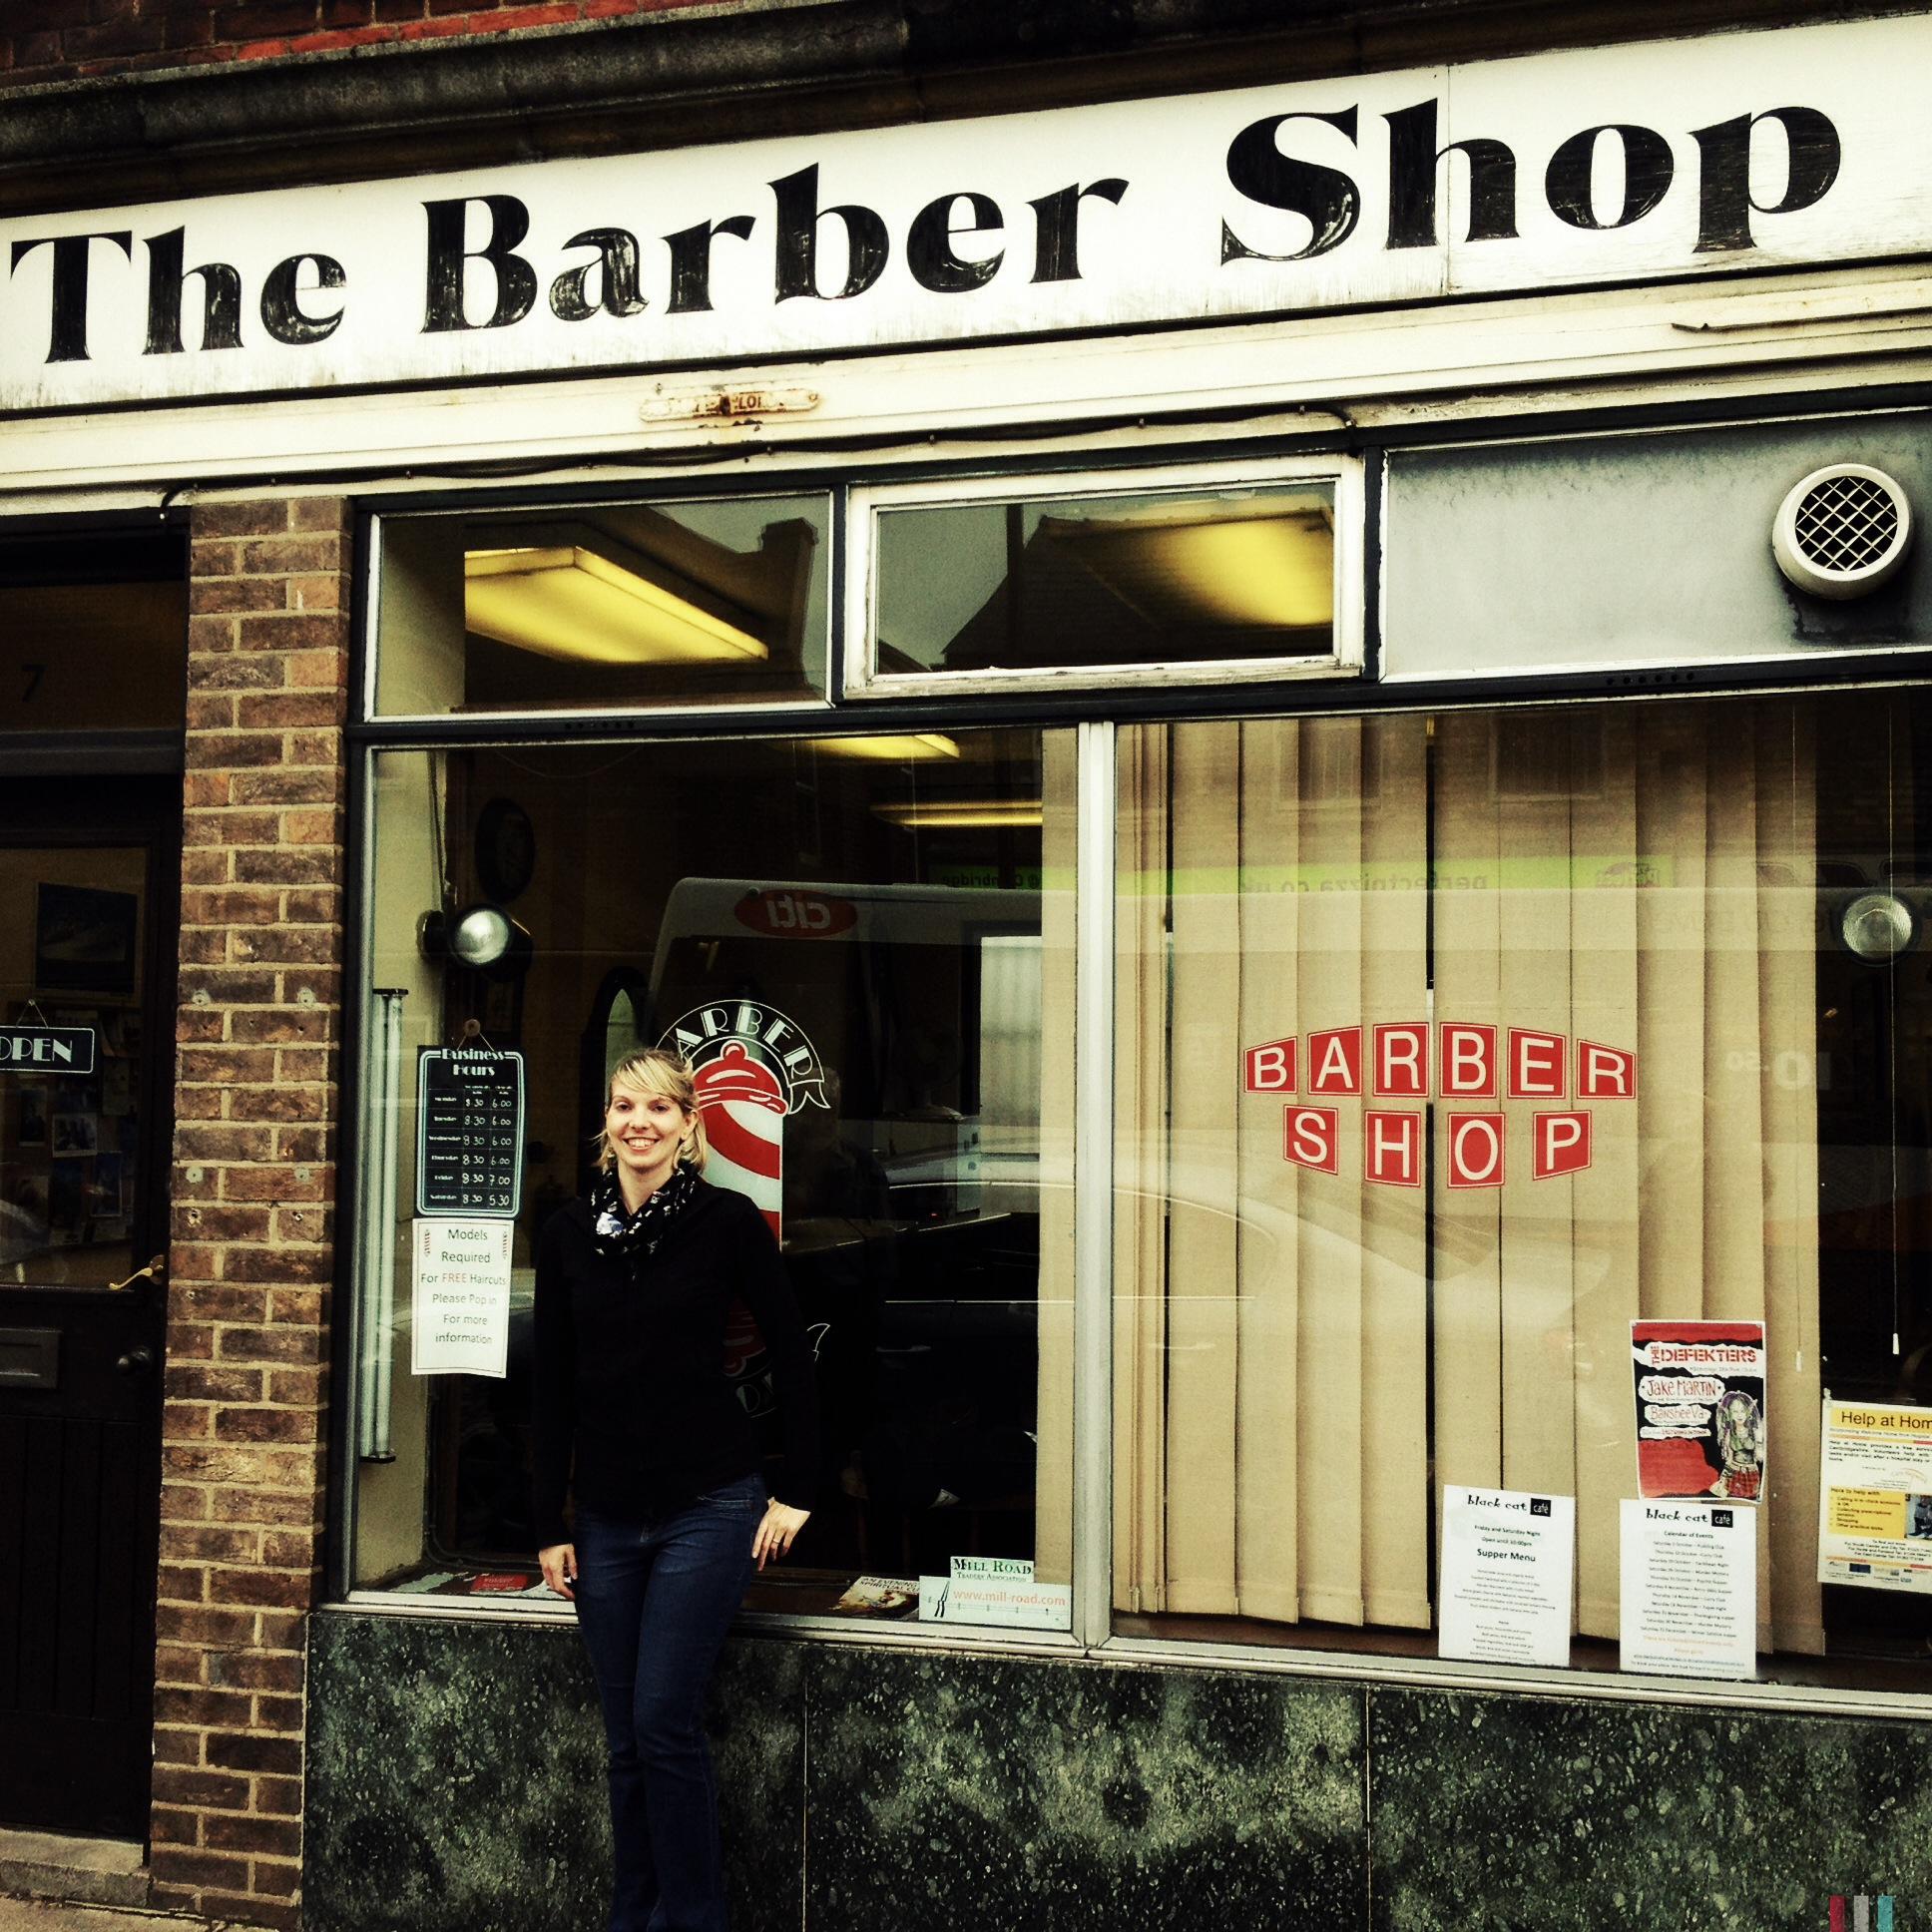 The Barber Shop, 7 The Broadway, Mill Road, Cambridge, CB1 3AH